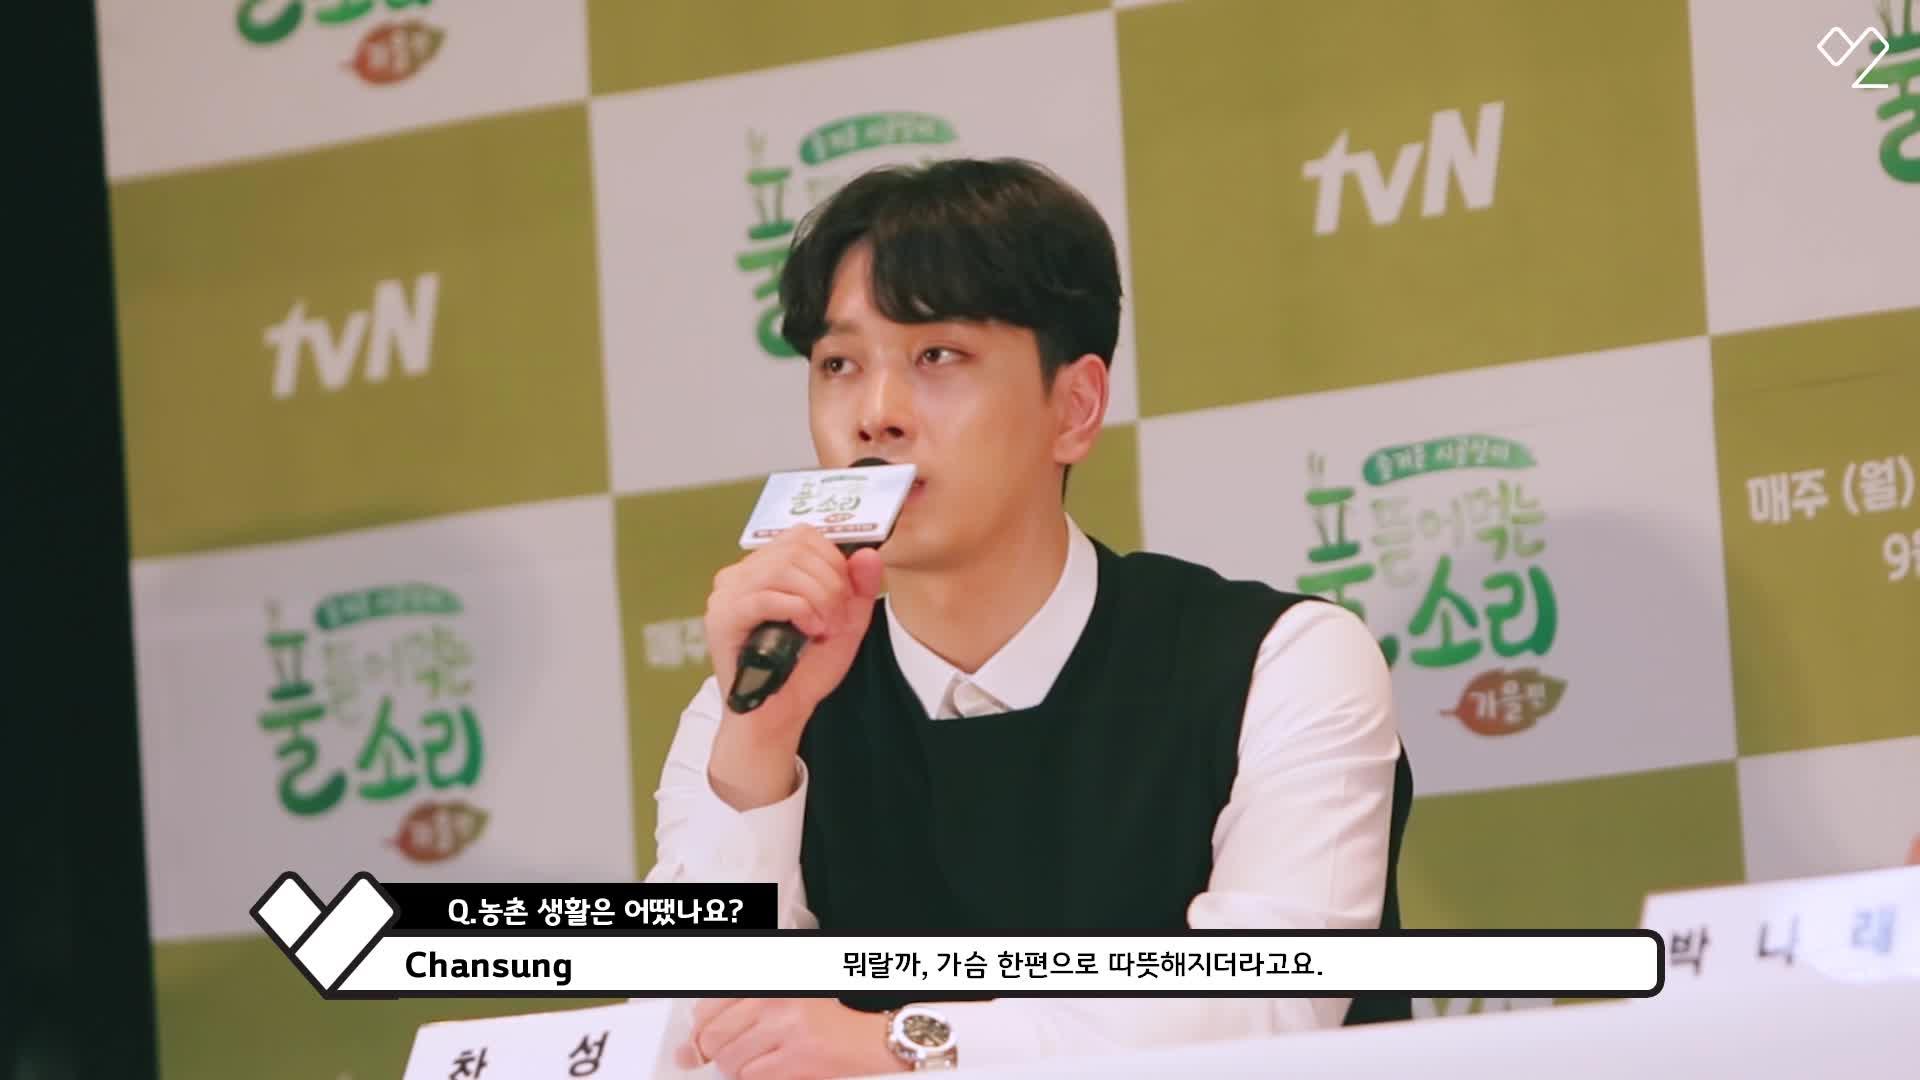 [On Air 2PM(온에어 2PM)] 농촌식구 케미 뿜뿜! 찬성의 '풀 뜯어먹는 소리' 제작발표회 현장